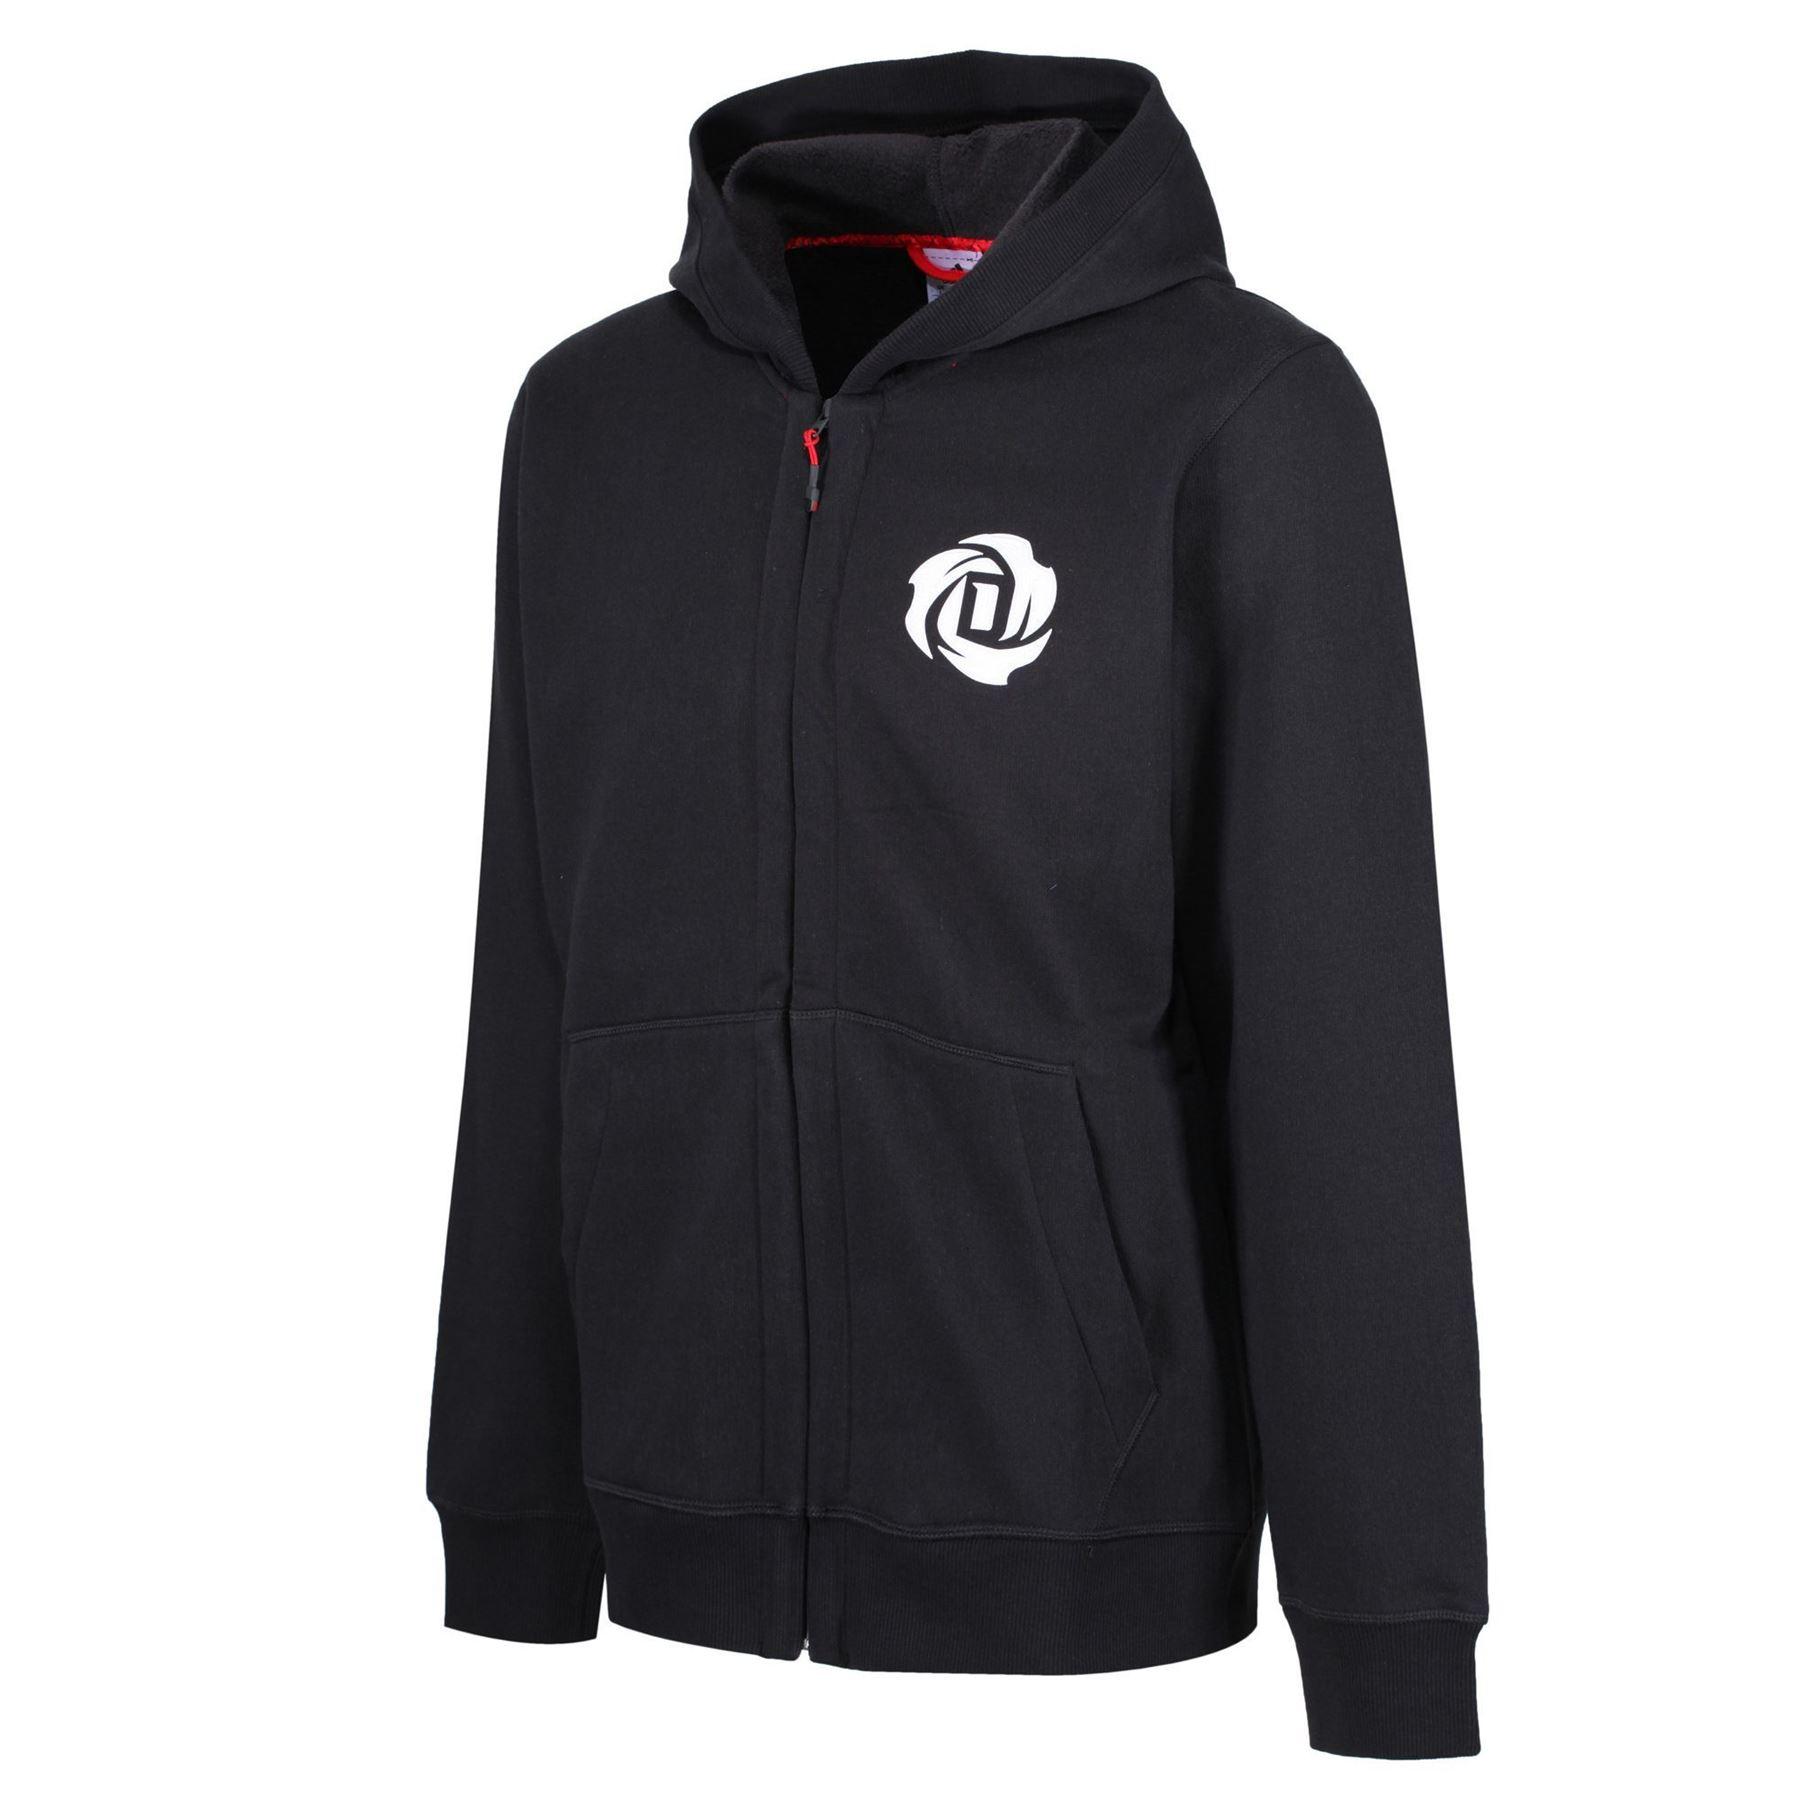 Rose Zip Adidas Derrick L 3xl Black Tall Basketball Men's About Hoodie Sizes Details Full OPXn0kN8w